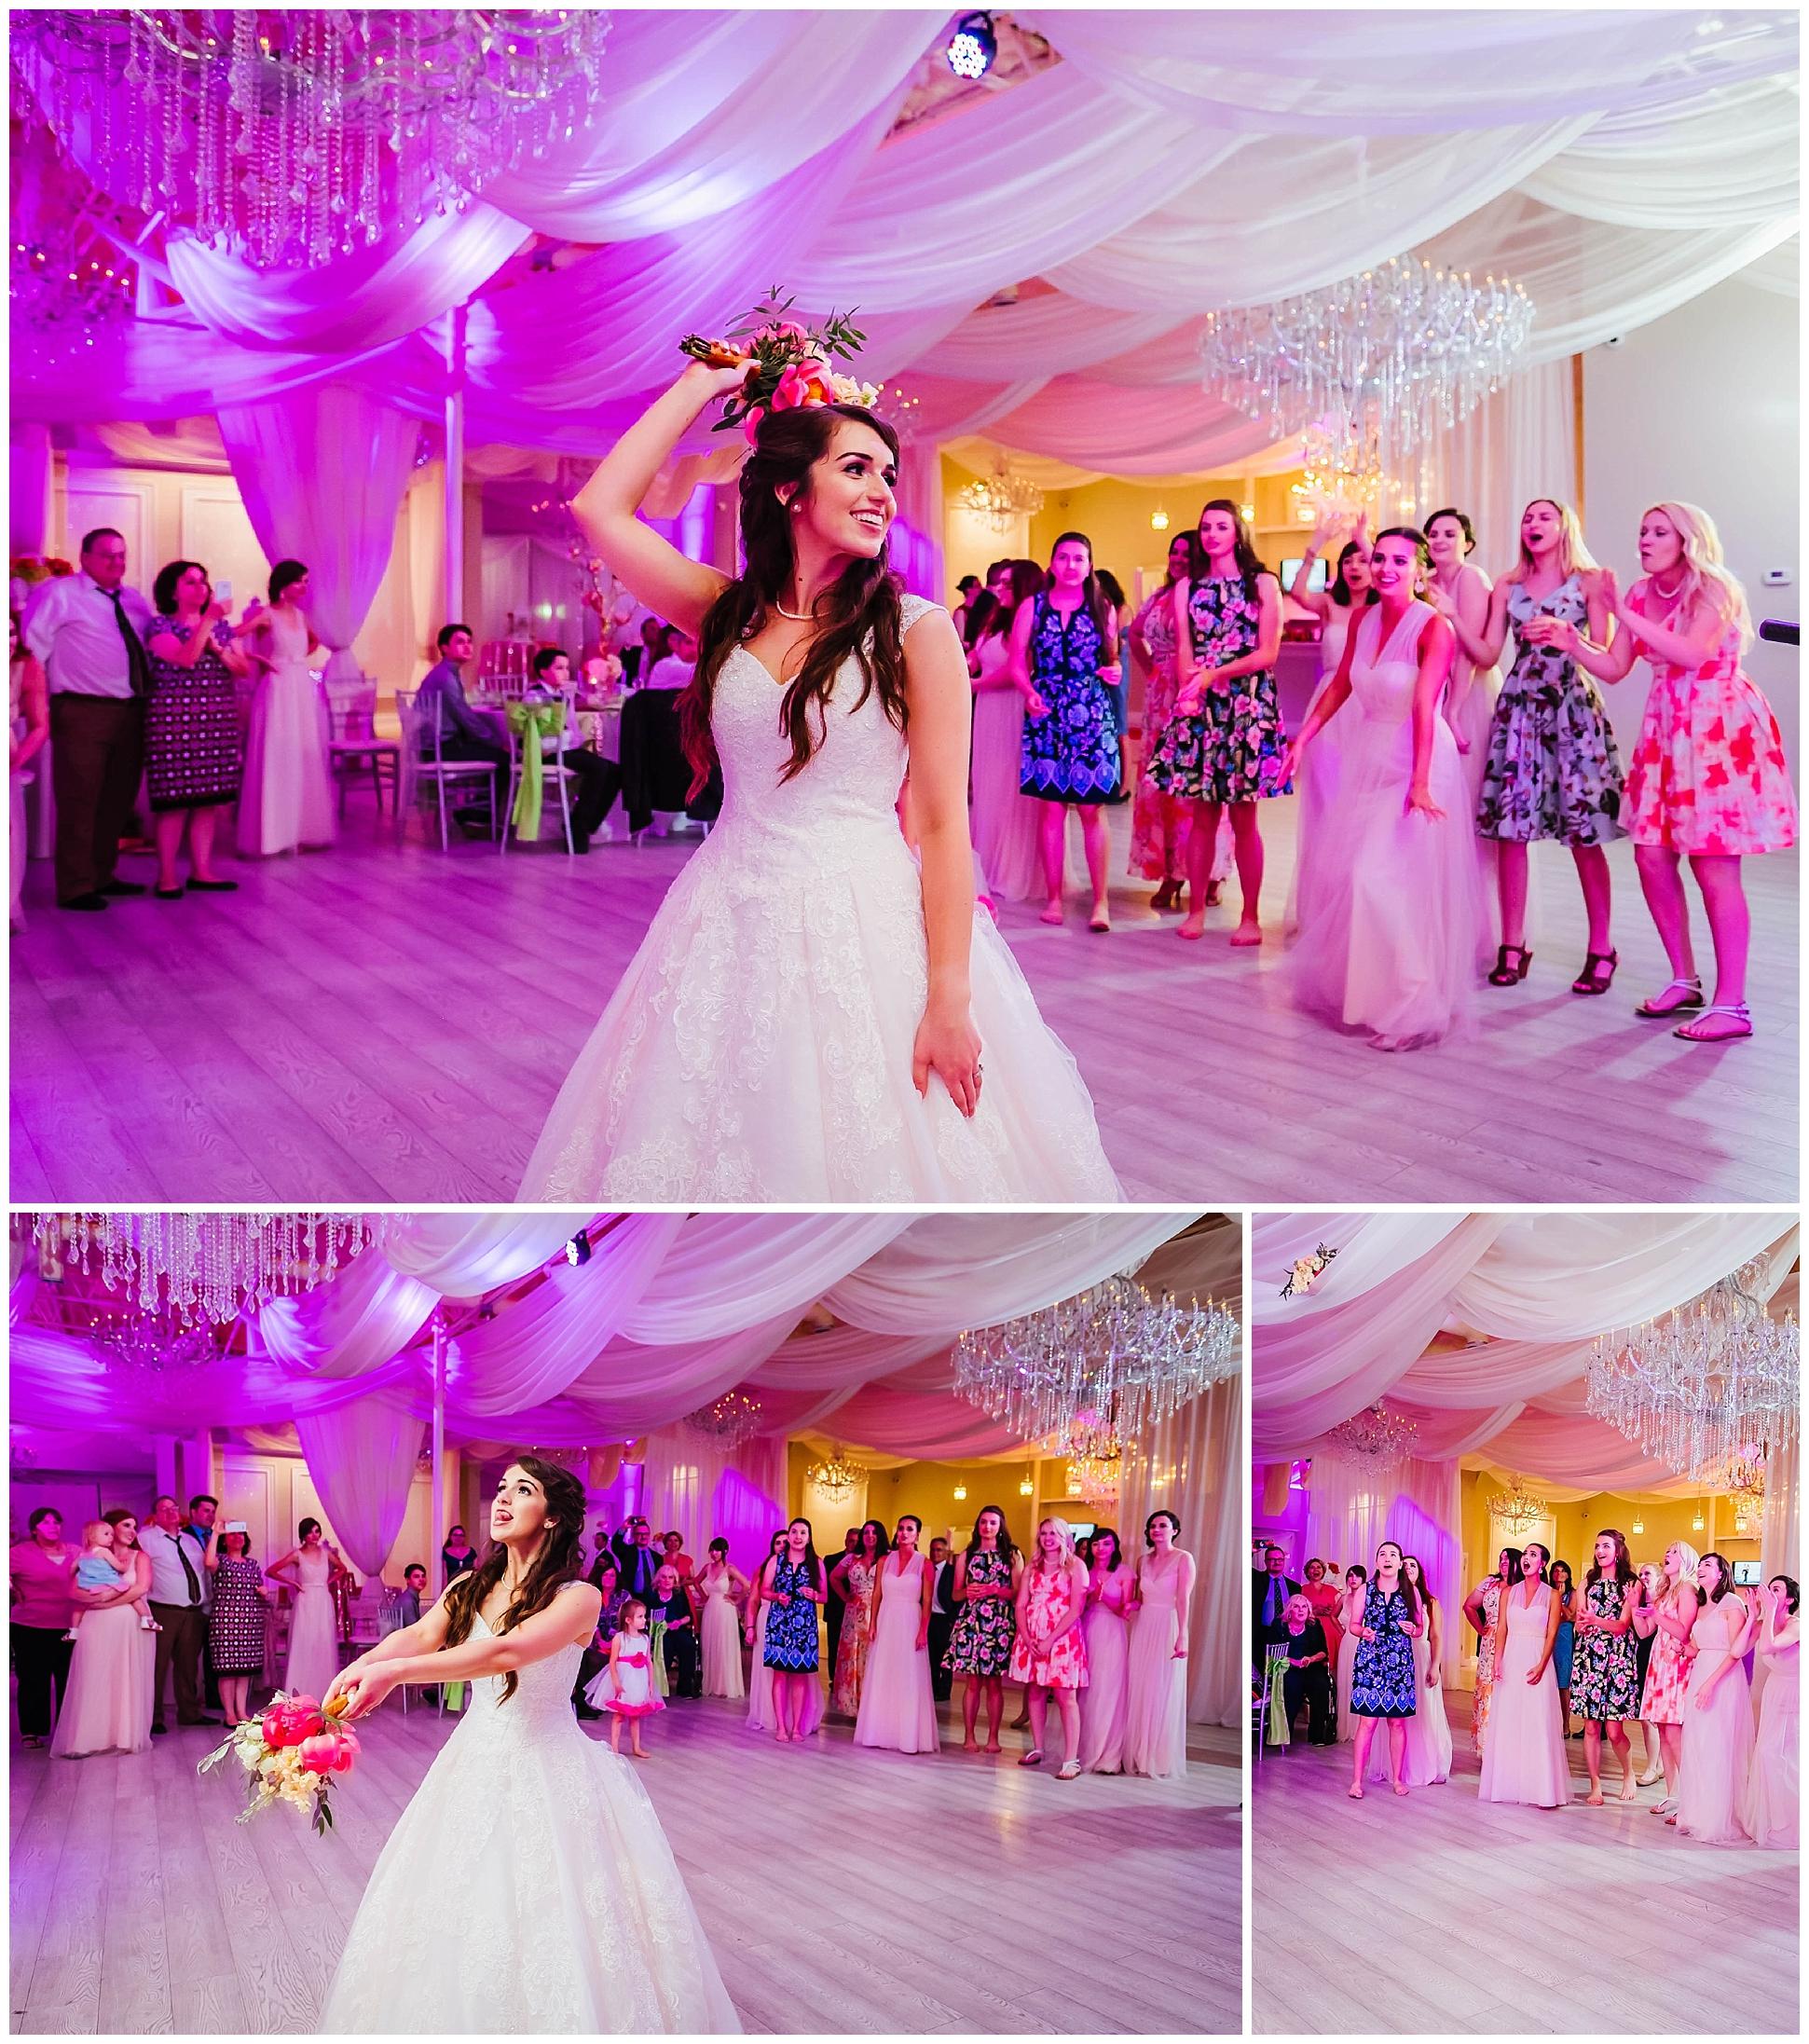 st-pete-wedding-photographer-sunken-gardens-crystal-ballroom-princess-dancer_0202.jpg